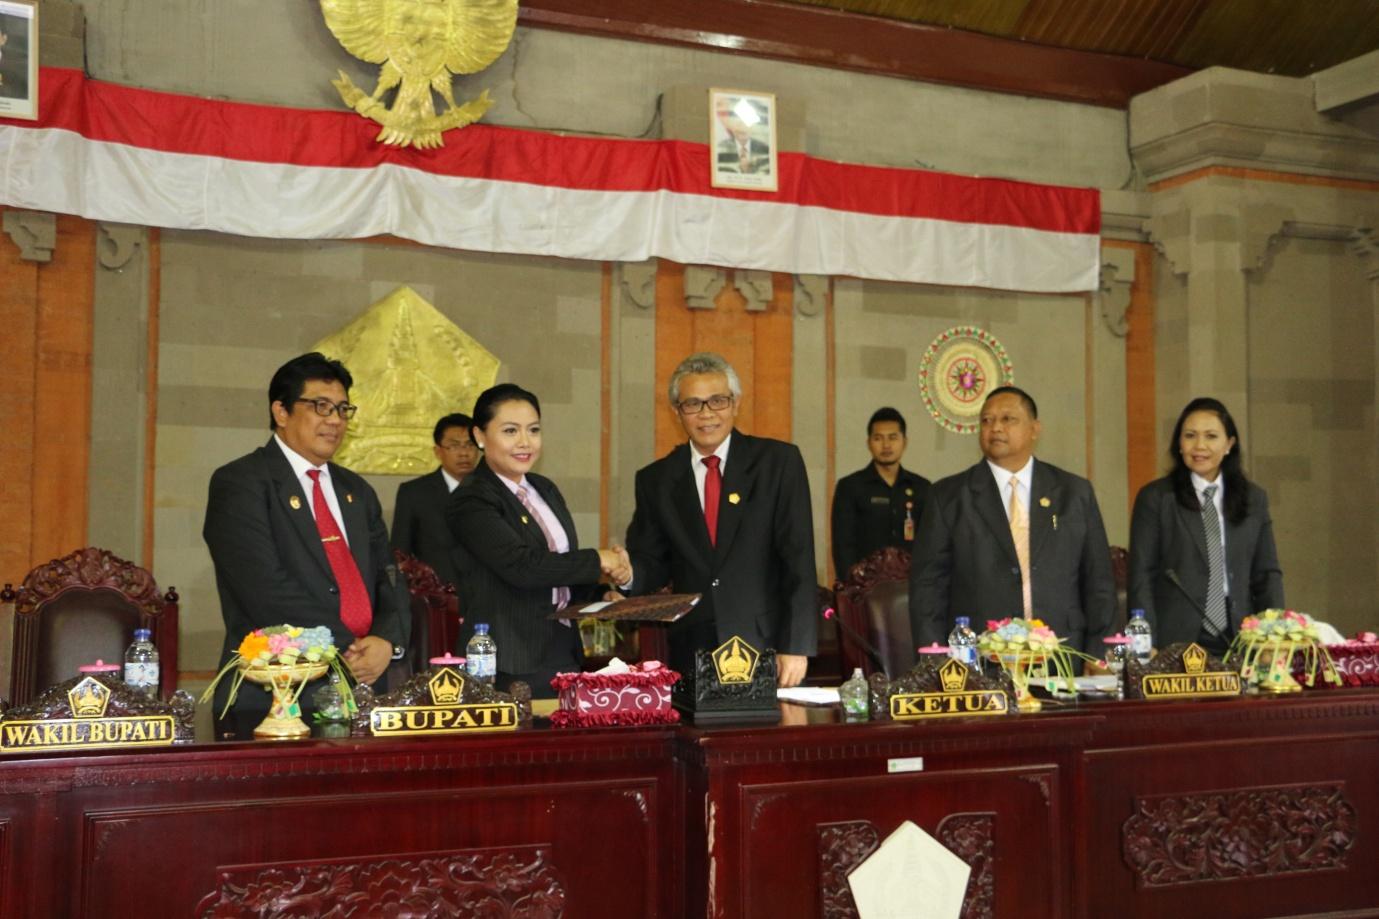 Catatan Dan Rekomendasi Dewan Terkait Laporan Keterangan Pertanggungjawaban (LKPJ) Bupati Tahun 2014